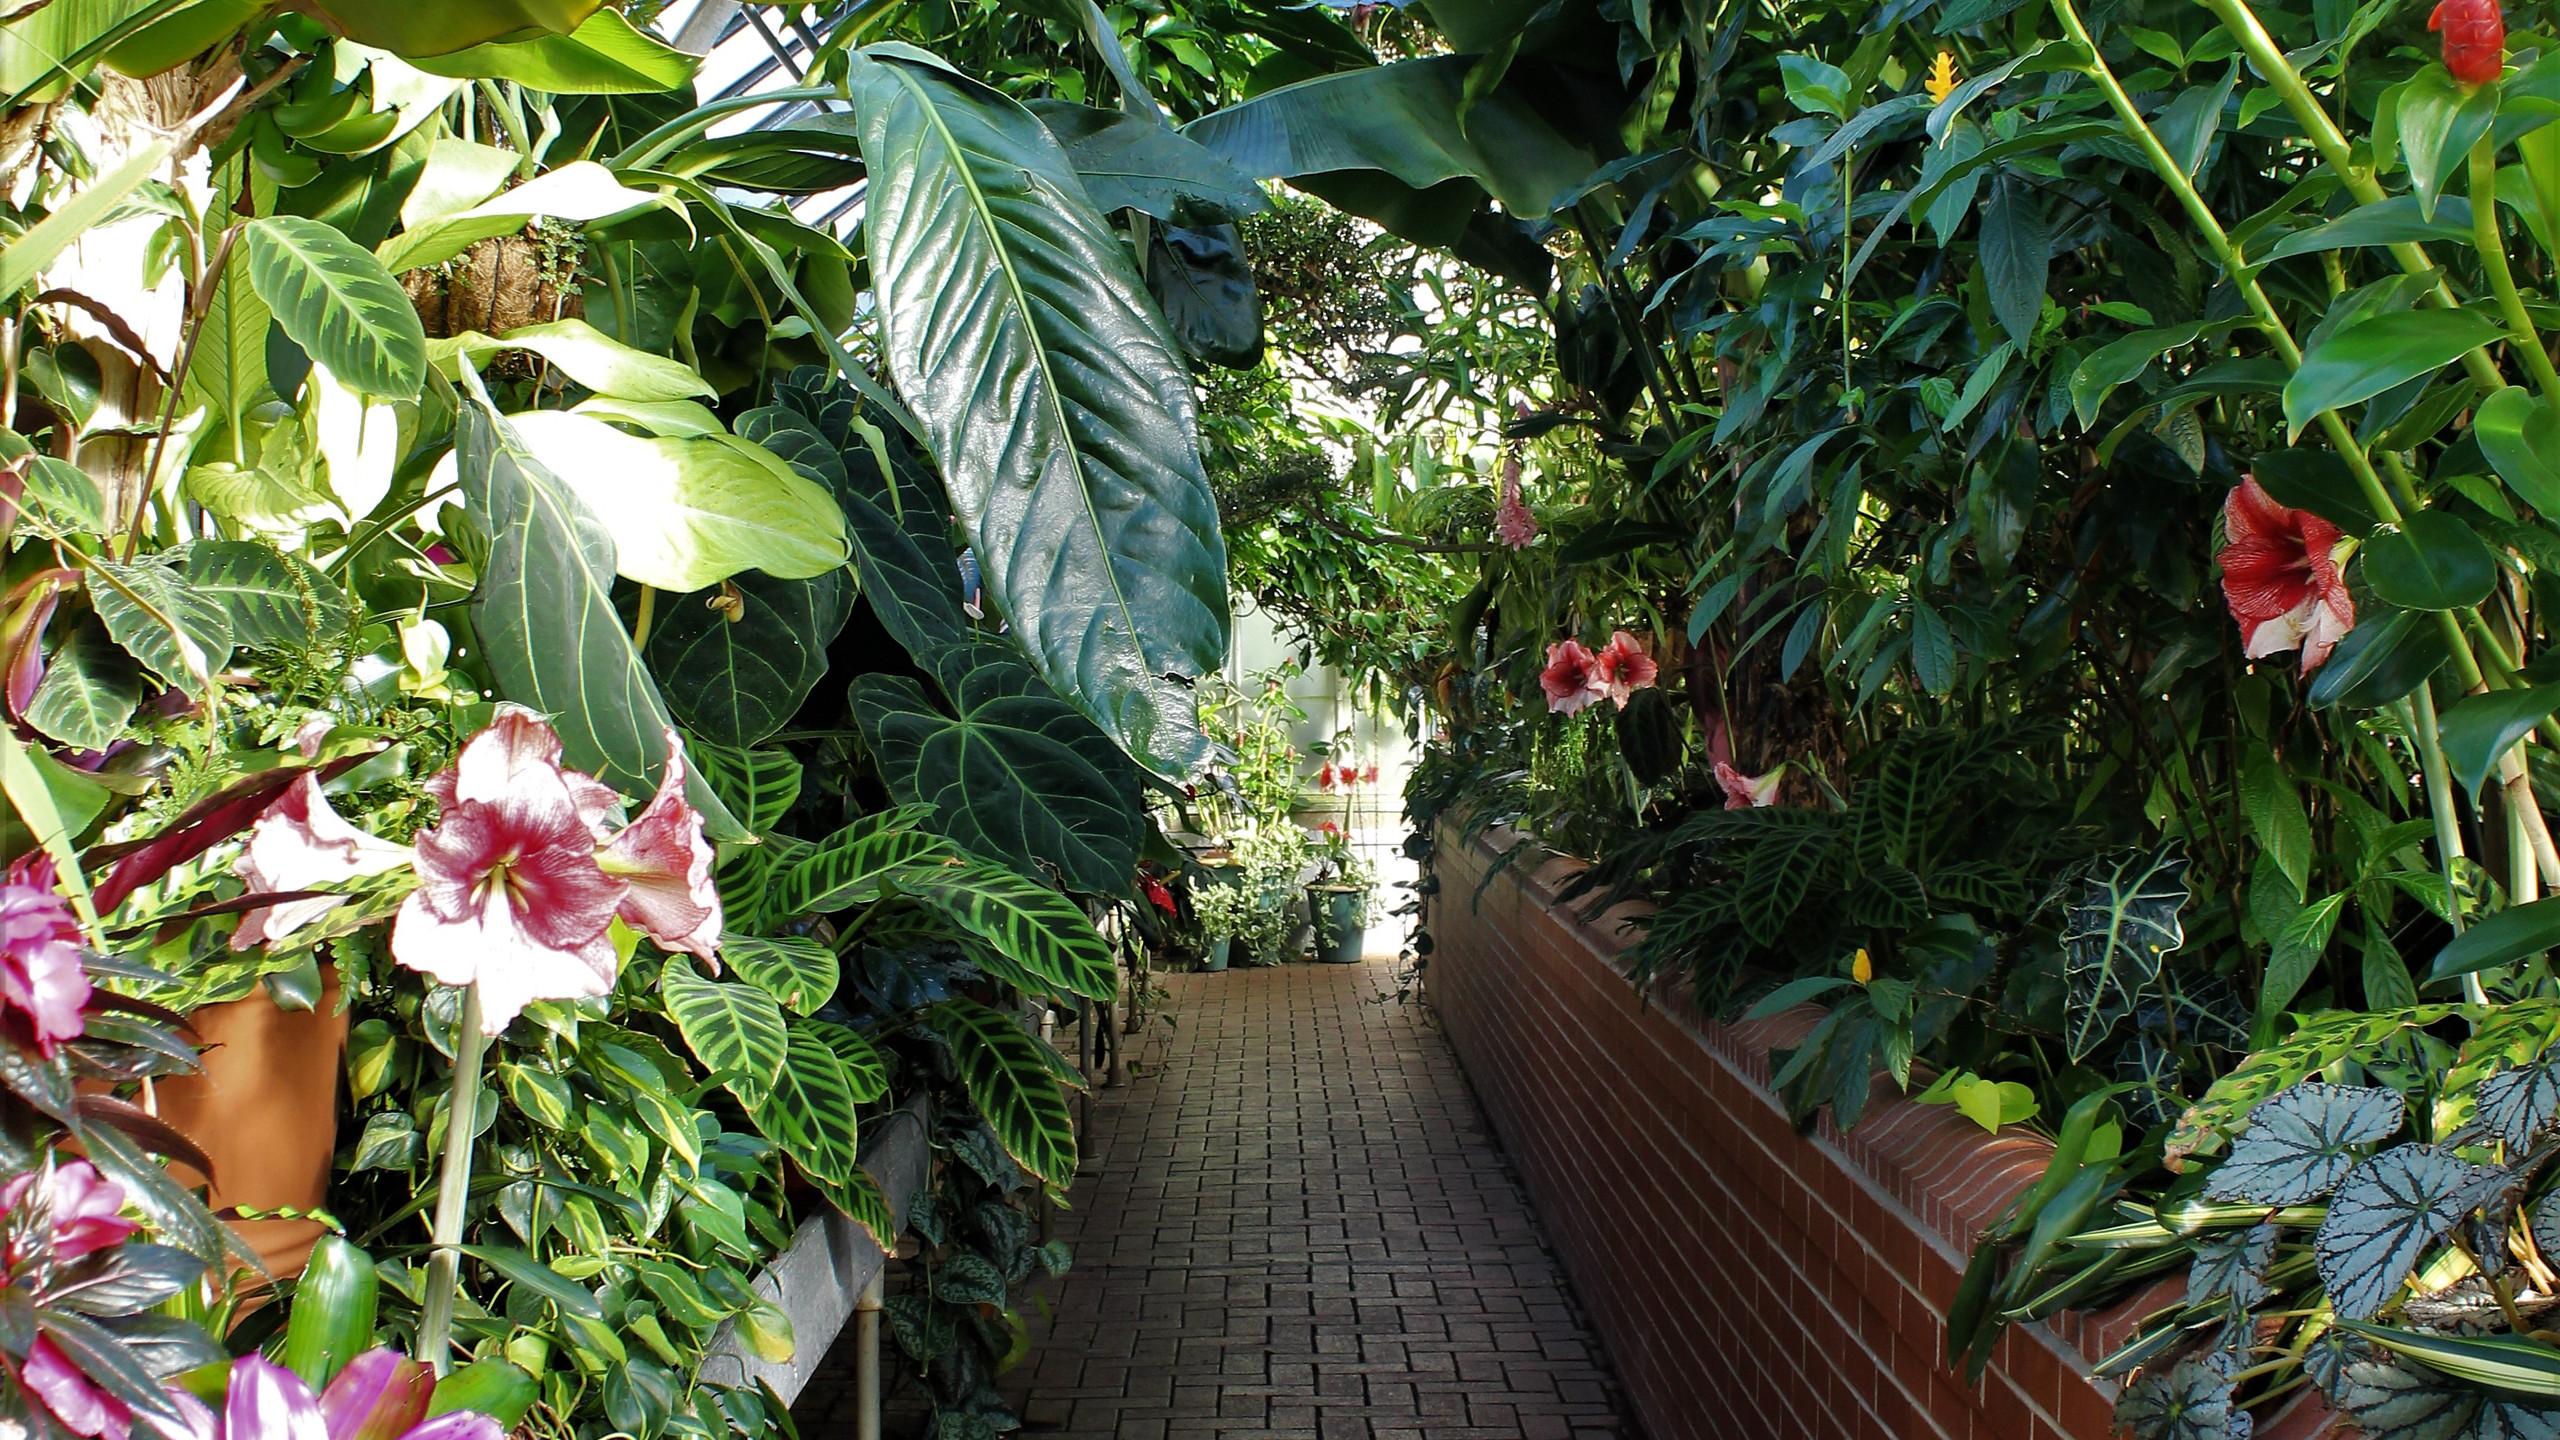 Vegetation in the Conservancy